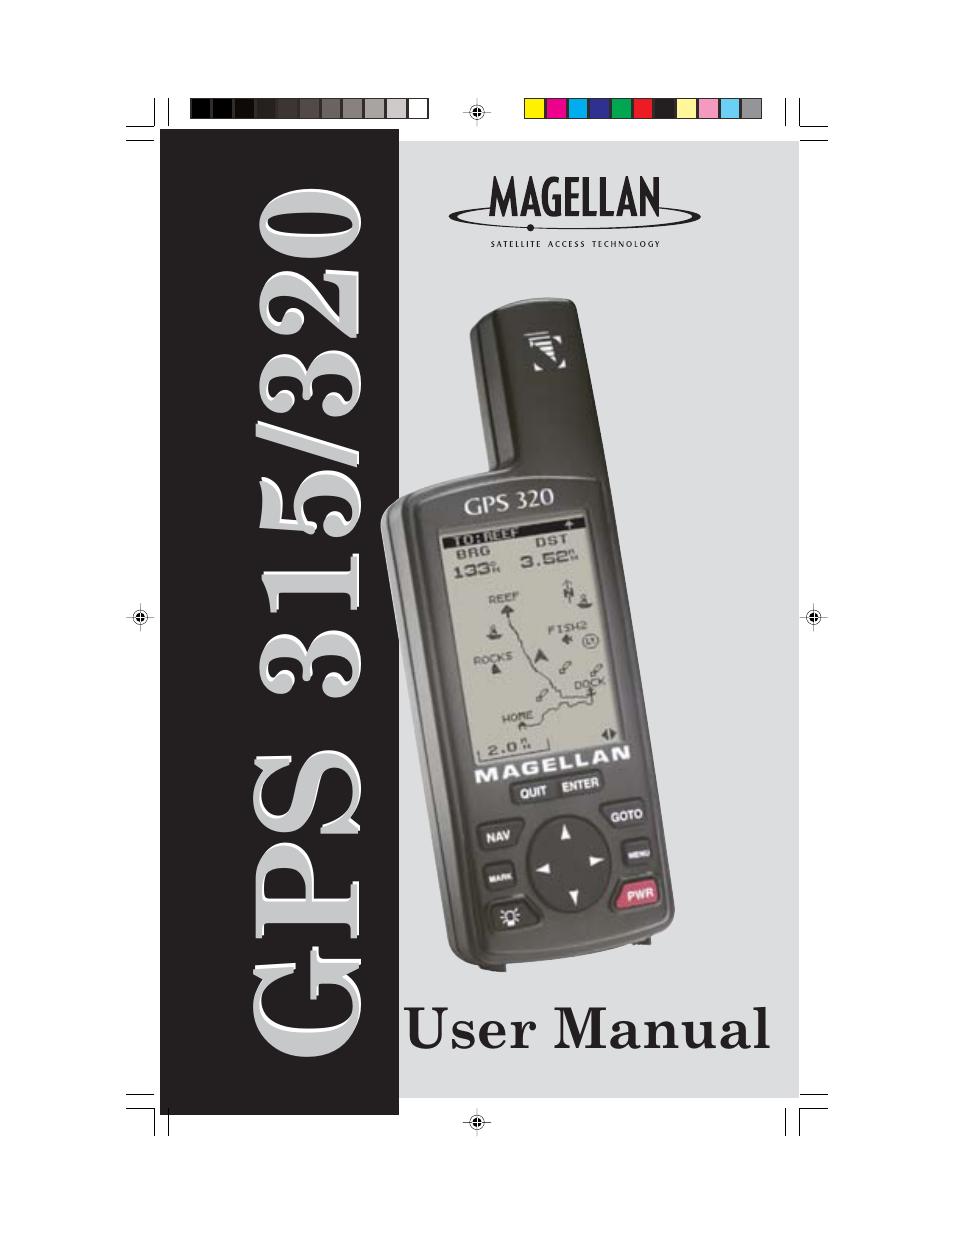 magellan gps 320 user manual 78 pages rh manualsdir com magellan gps manual download magellan gps manuals online